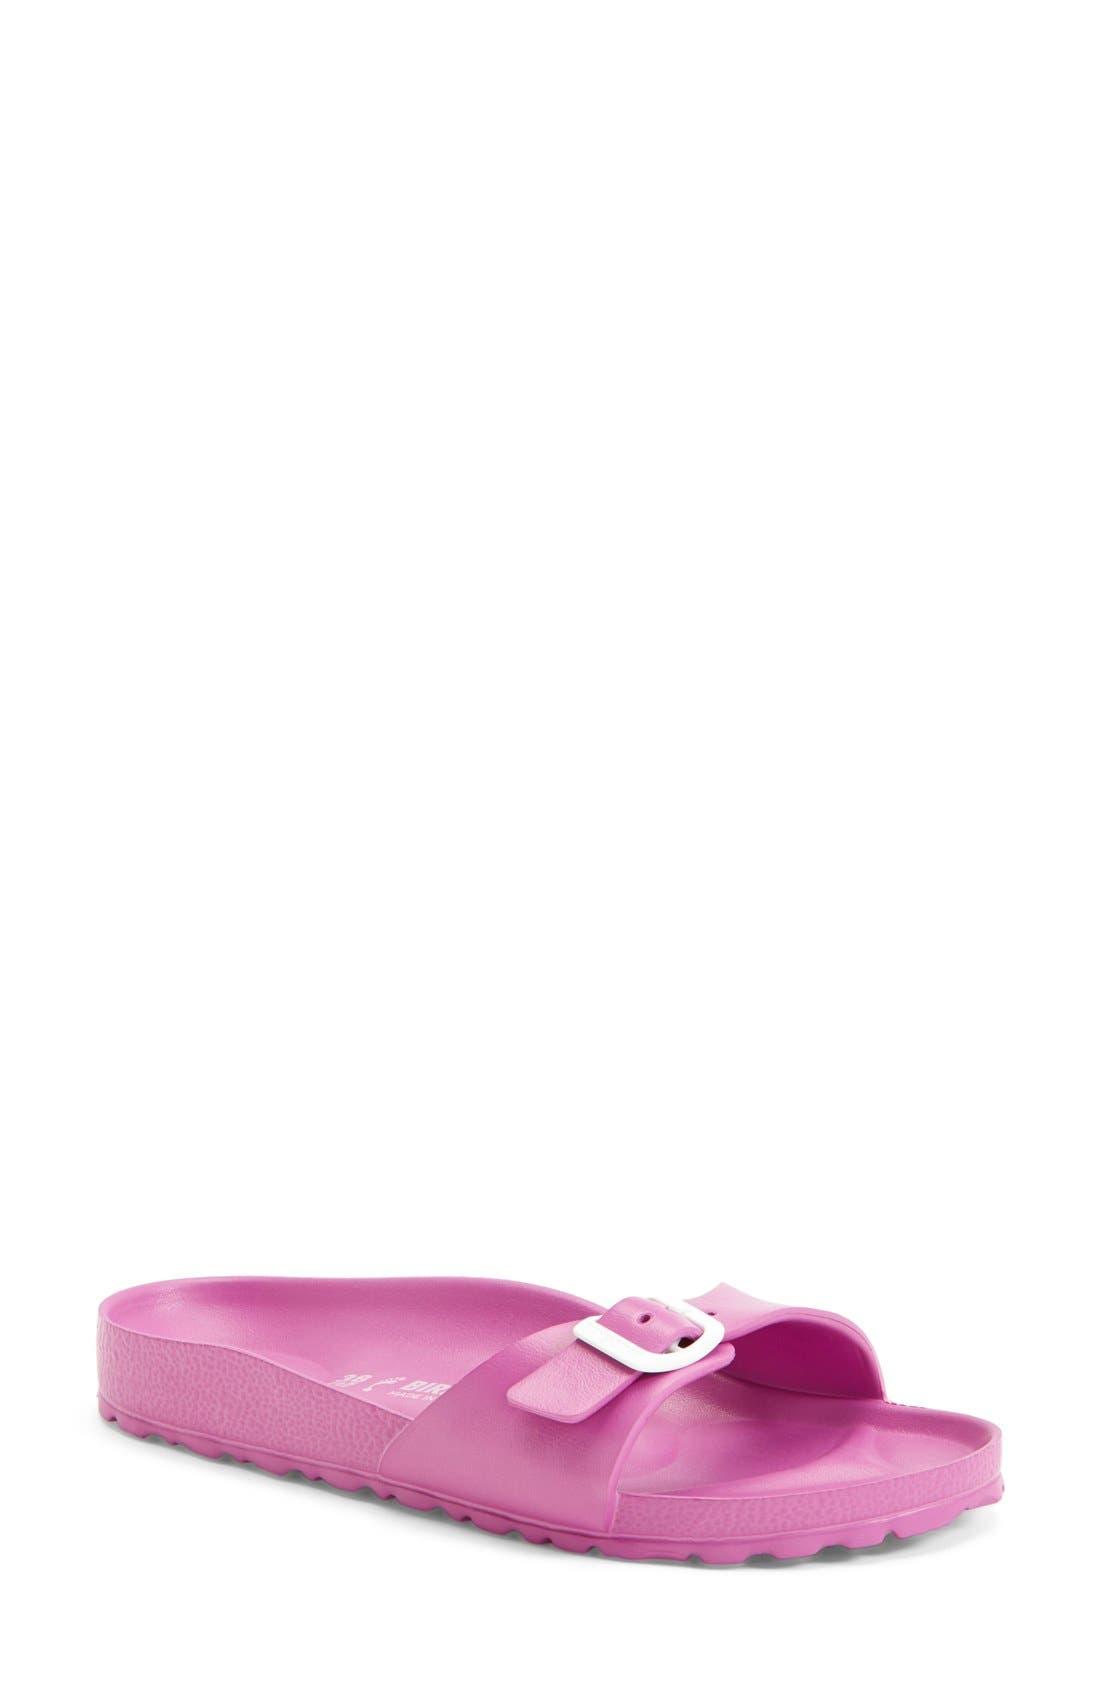 'Essentials - Madrid' Slide Sandal,                             Main thumbnail 1, color,                             Pink